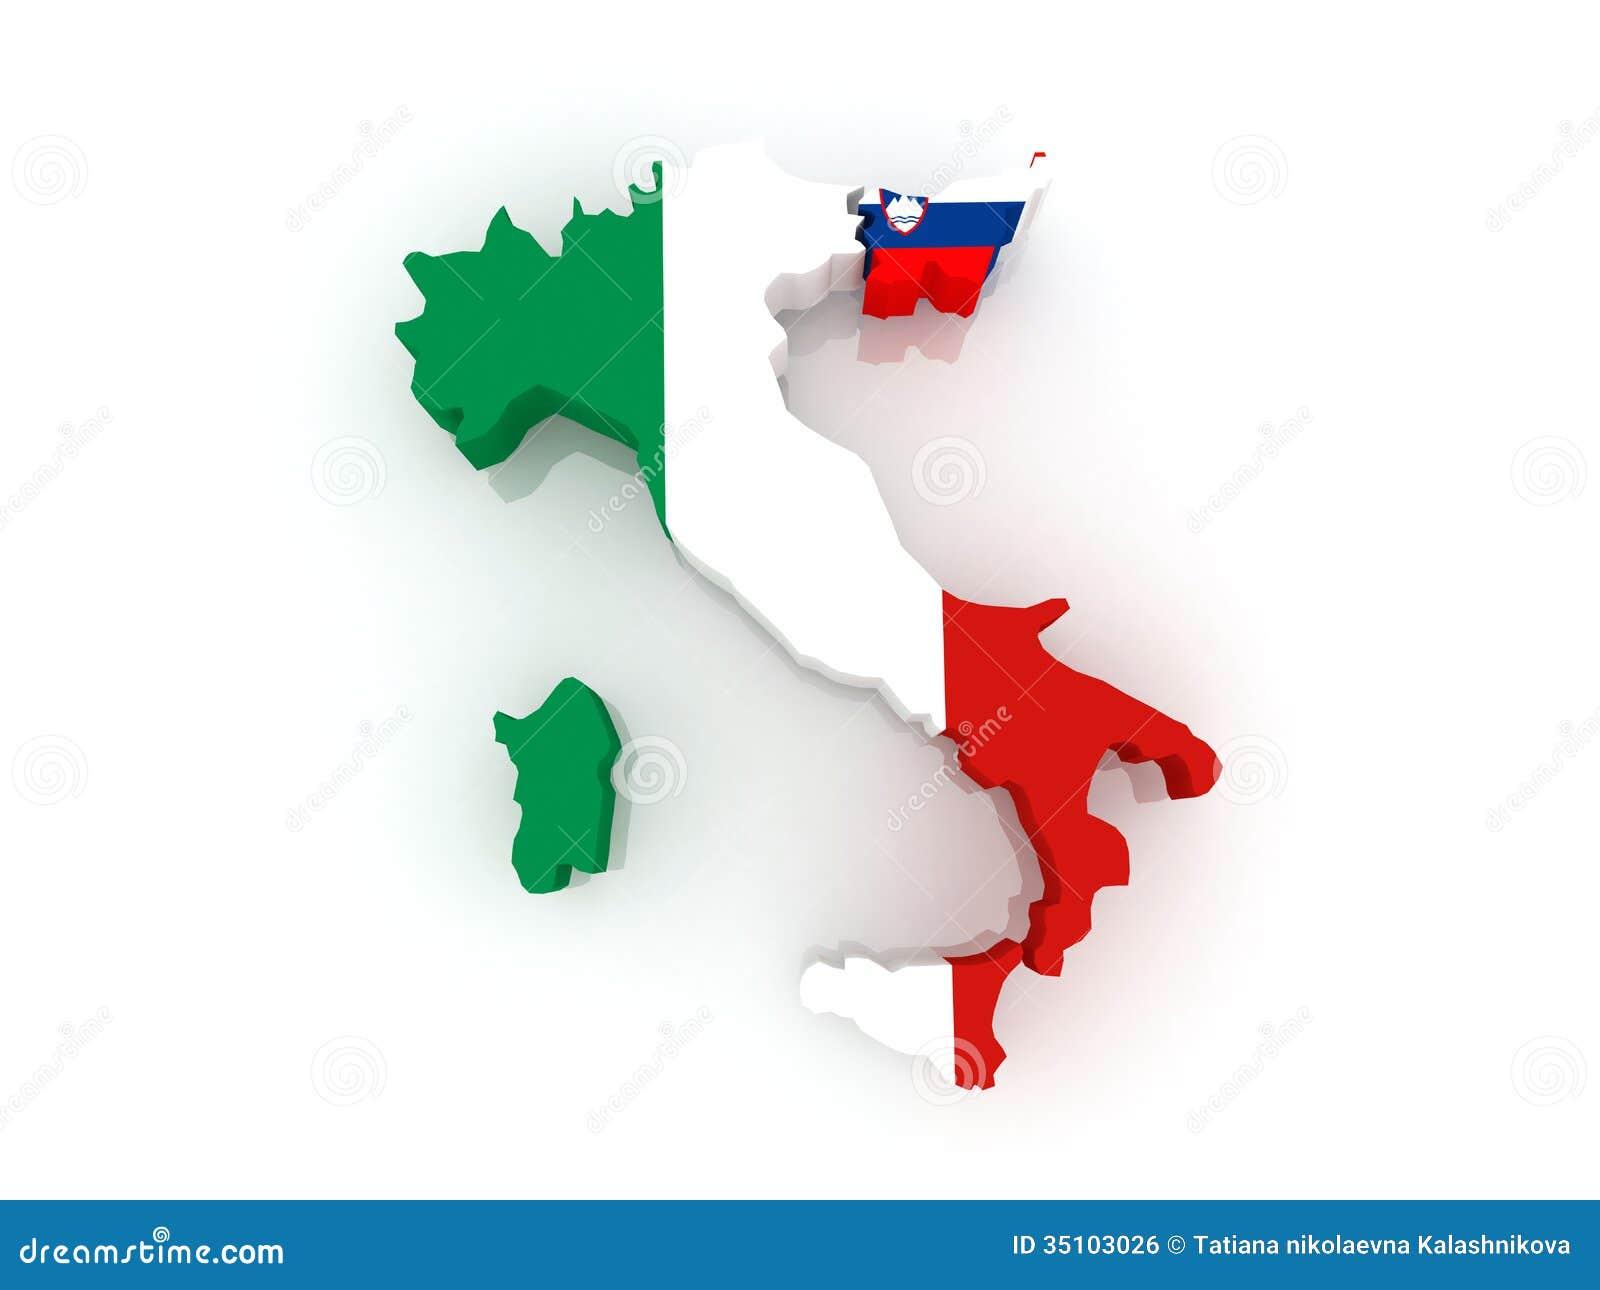 Mapa de Italia y de Eslovenia.